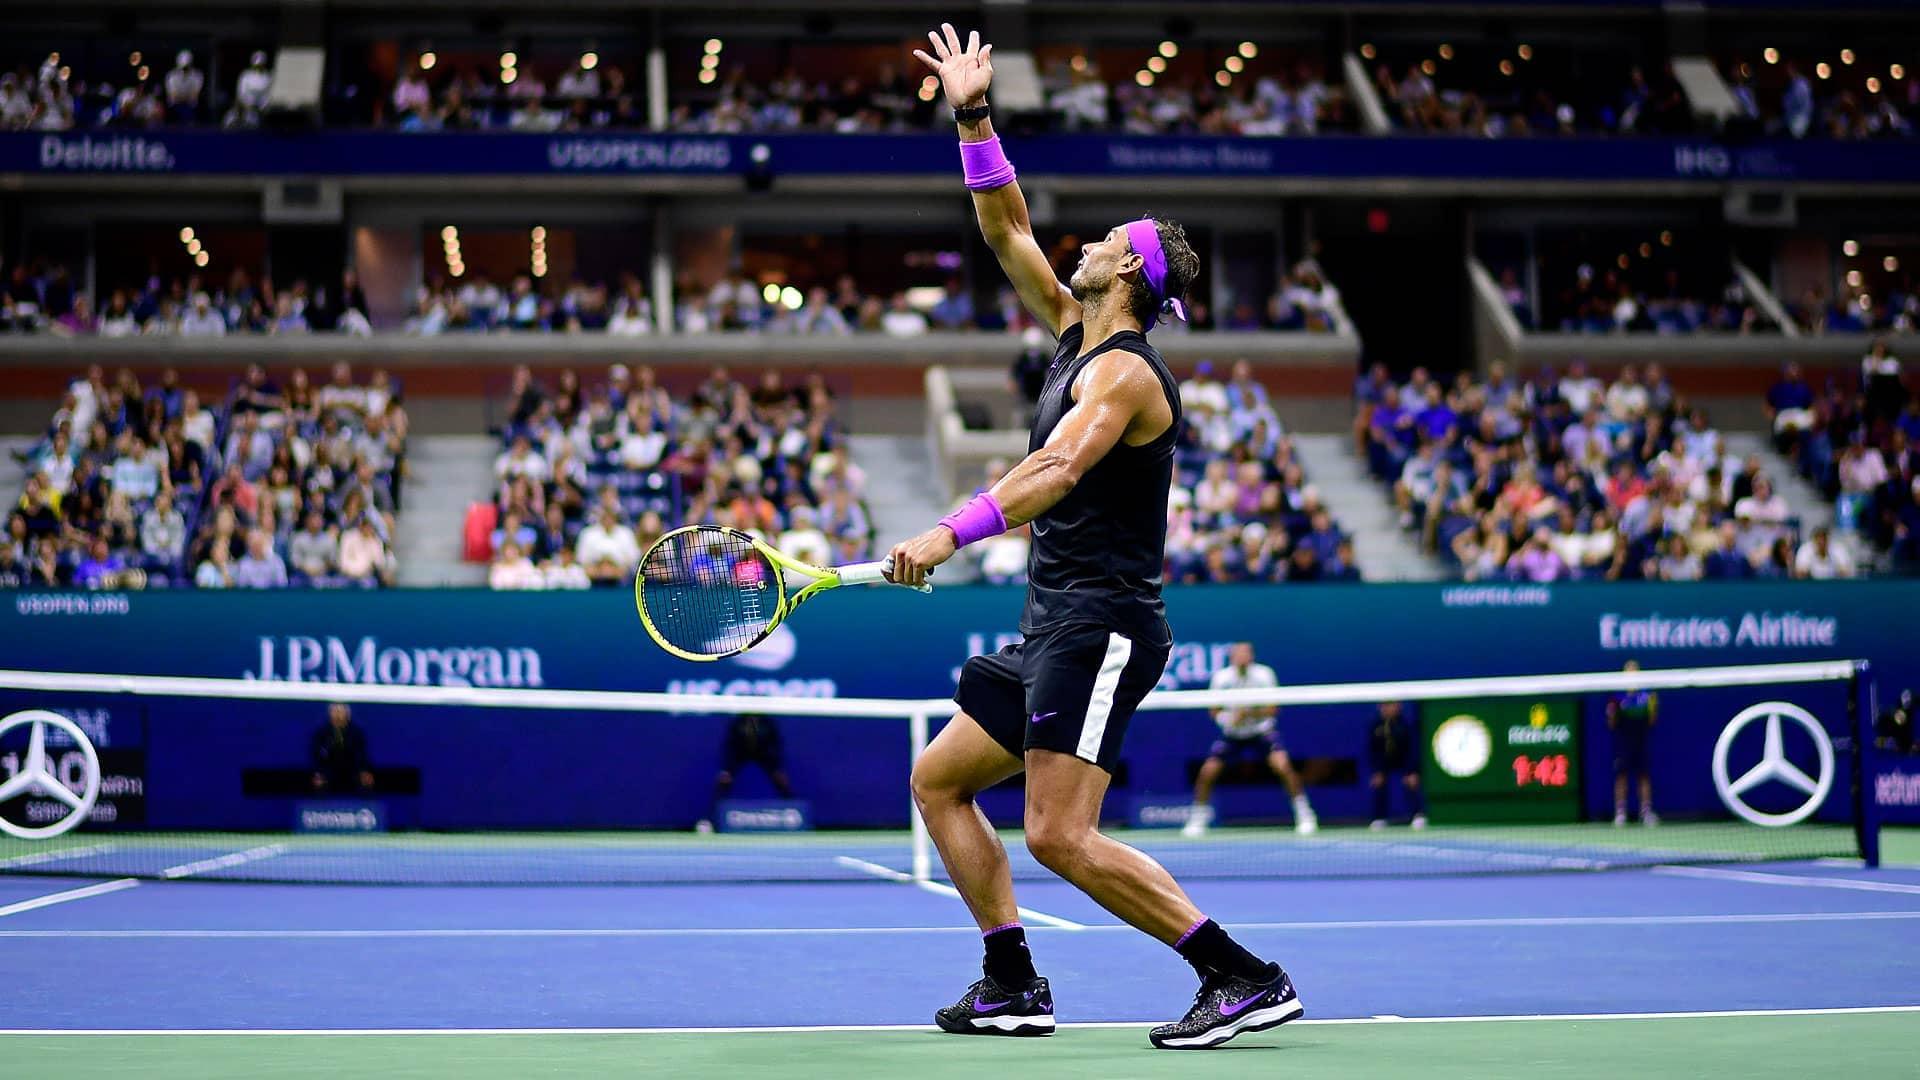 Rapid Rafa: Serve, Play And Win Faster | ATP Tour | Tennis